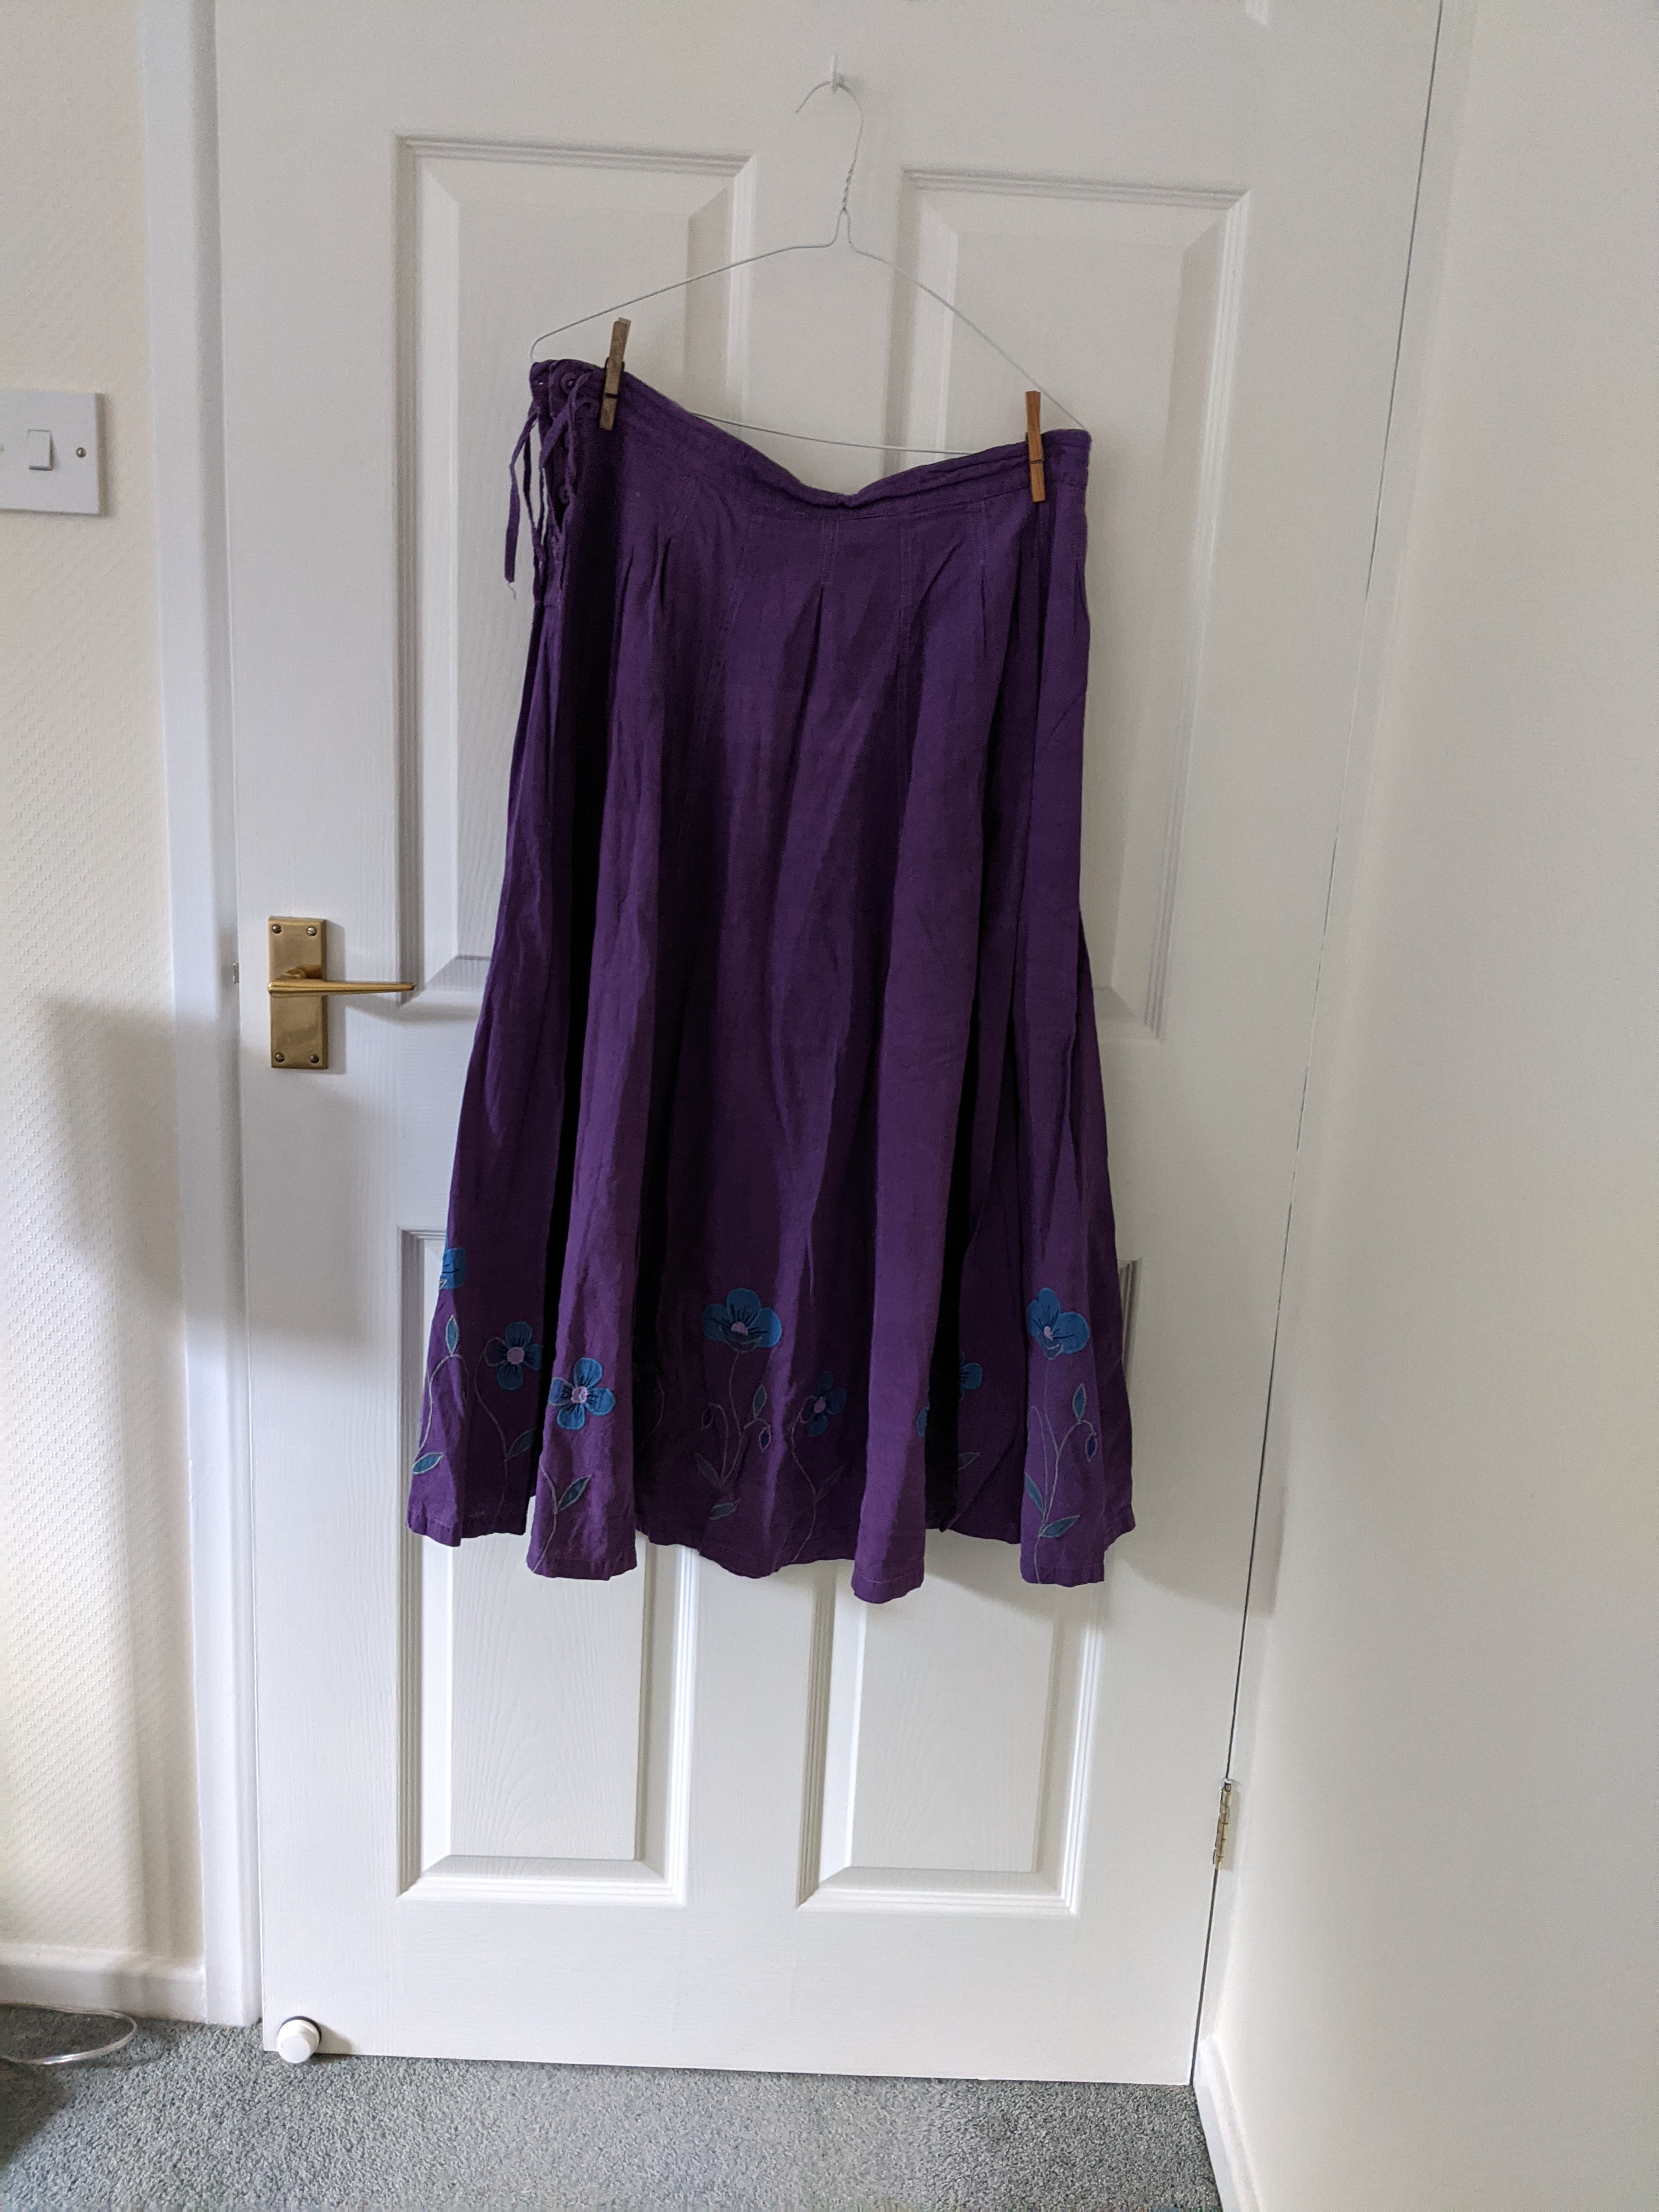 Image of Bishopston Skirt and jacket